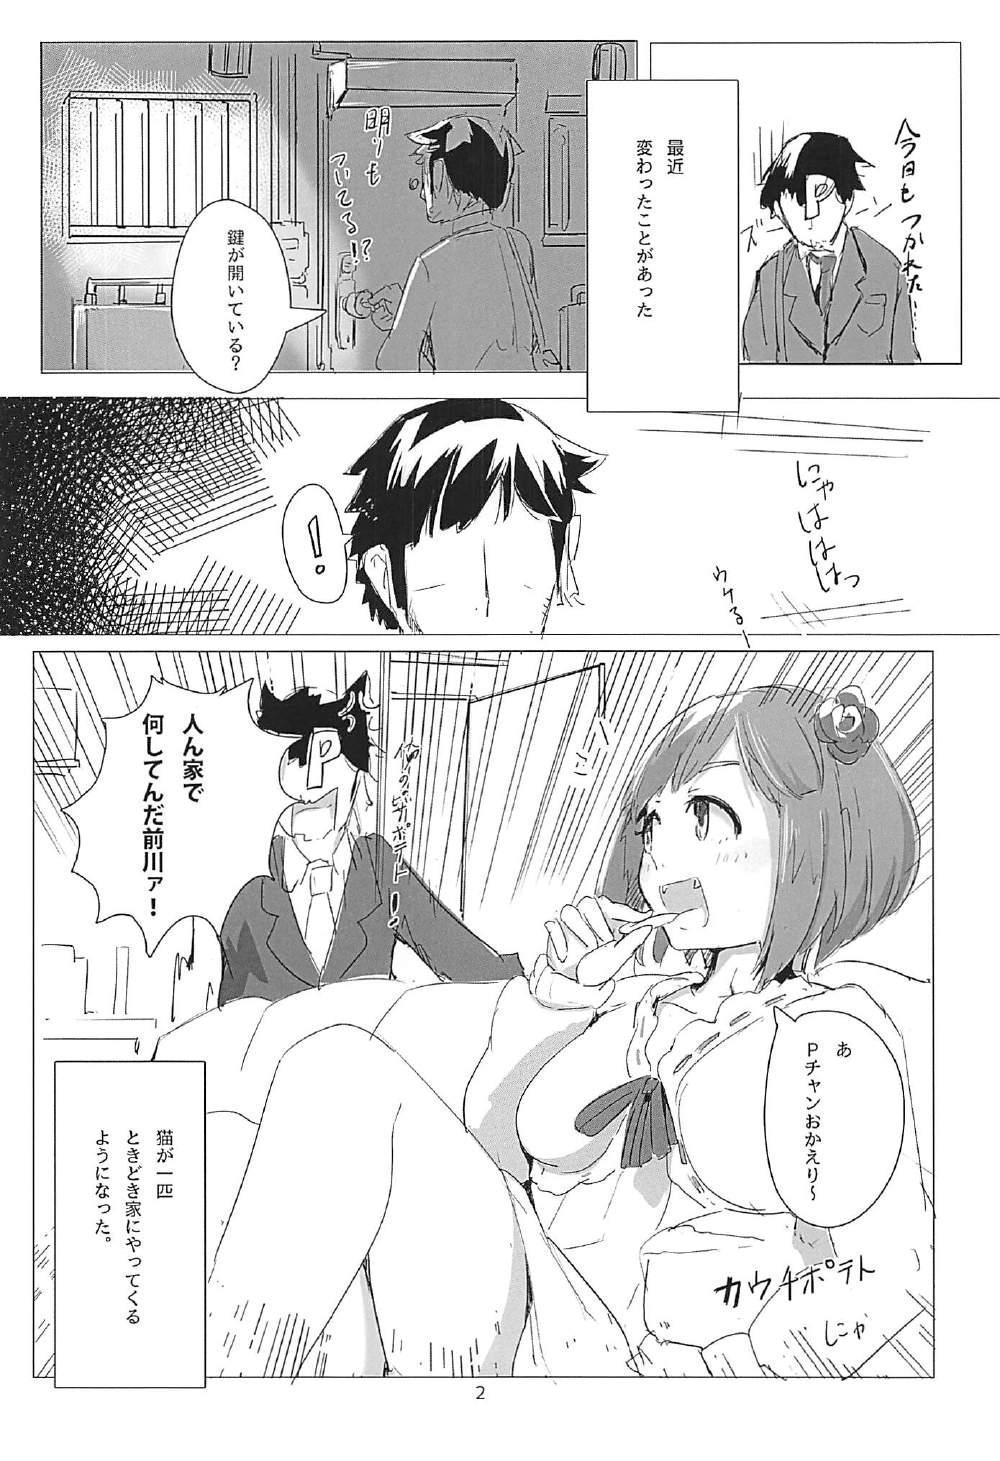 Miku-nyan no Hon 2